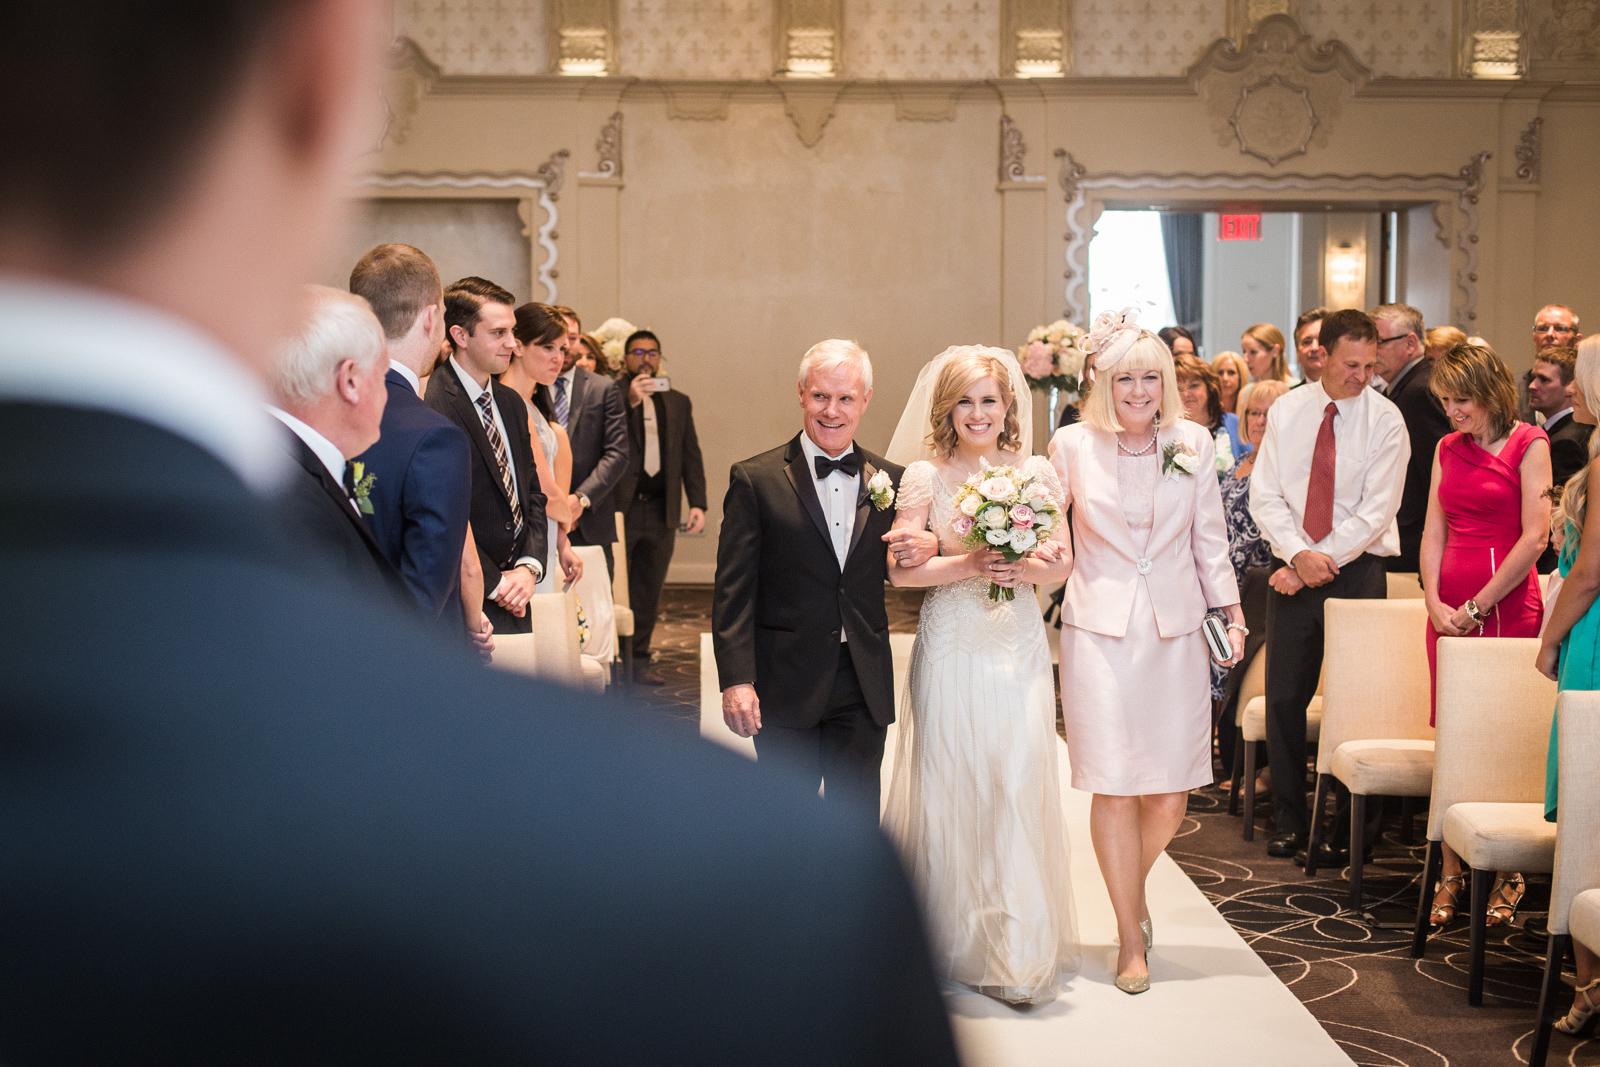 rosewood hotel georgia wedding (7 of 16)